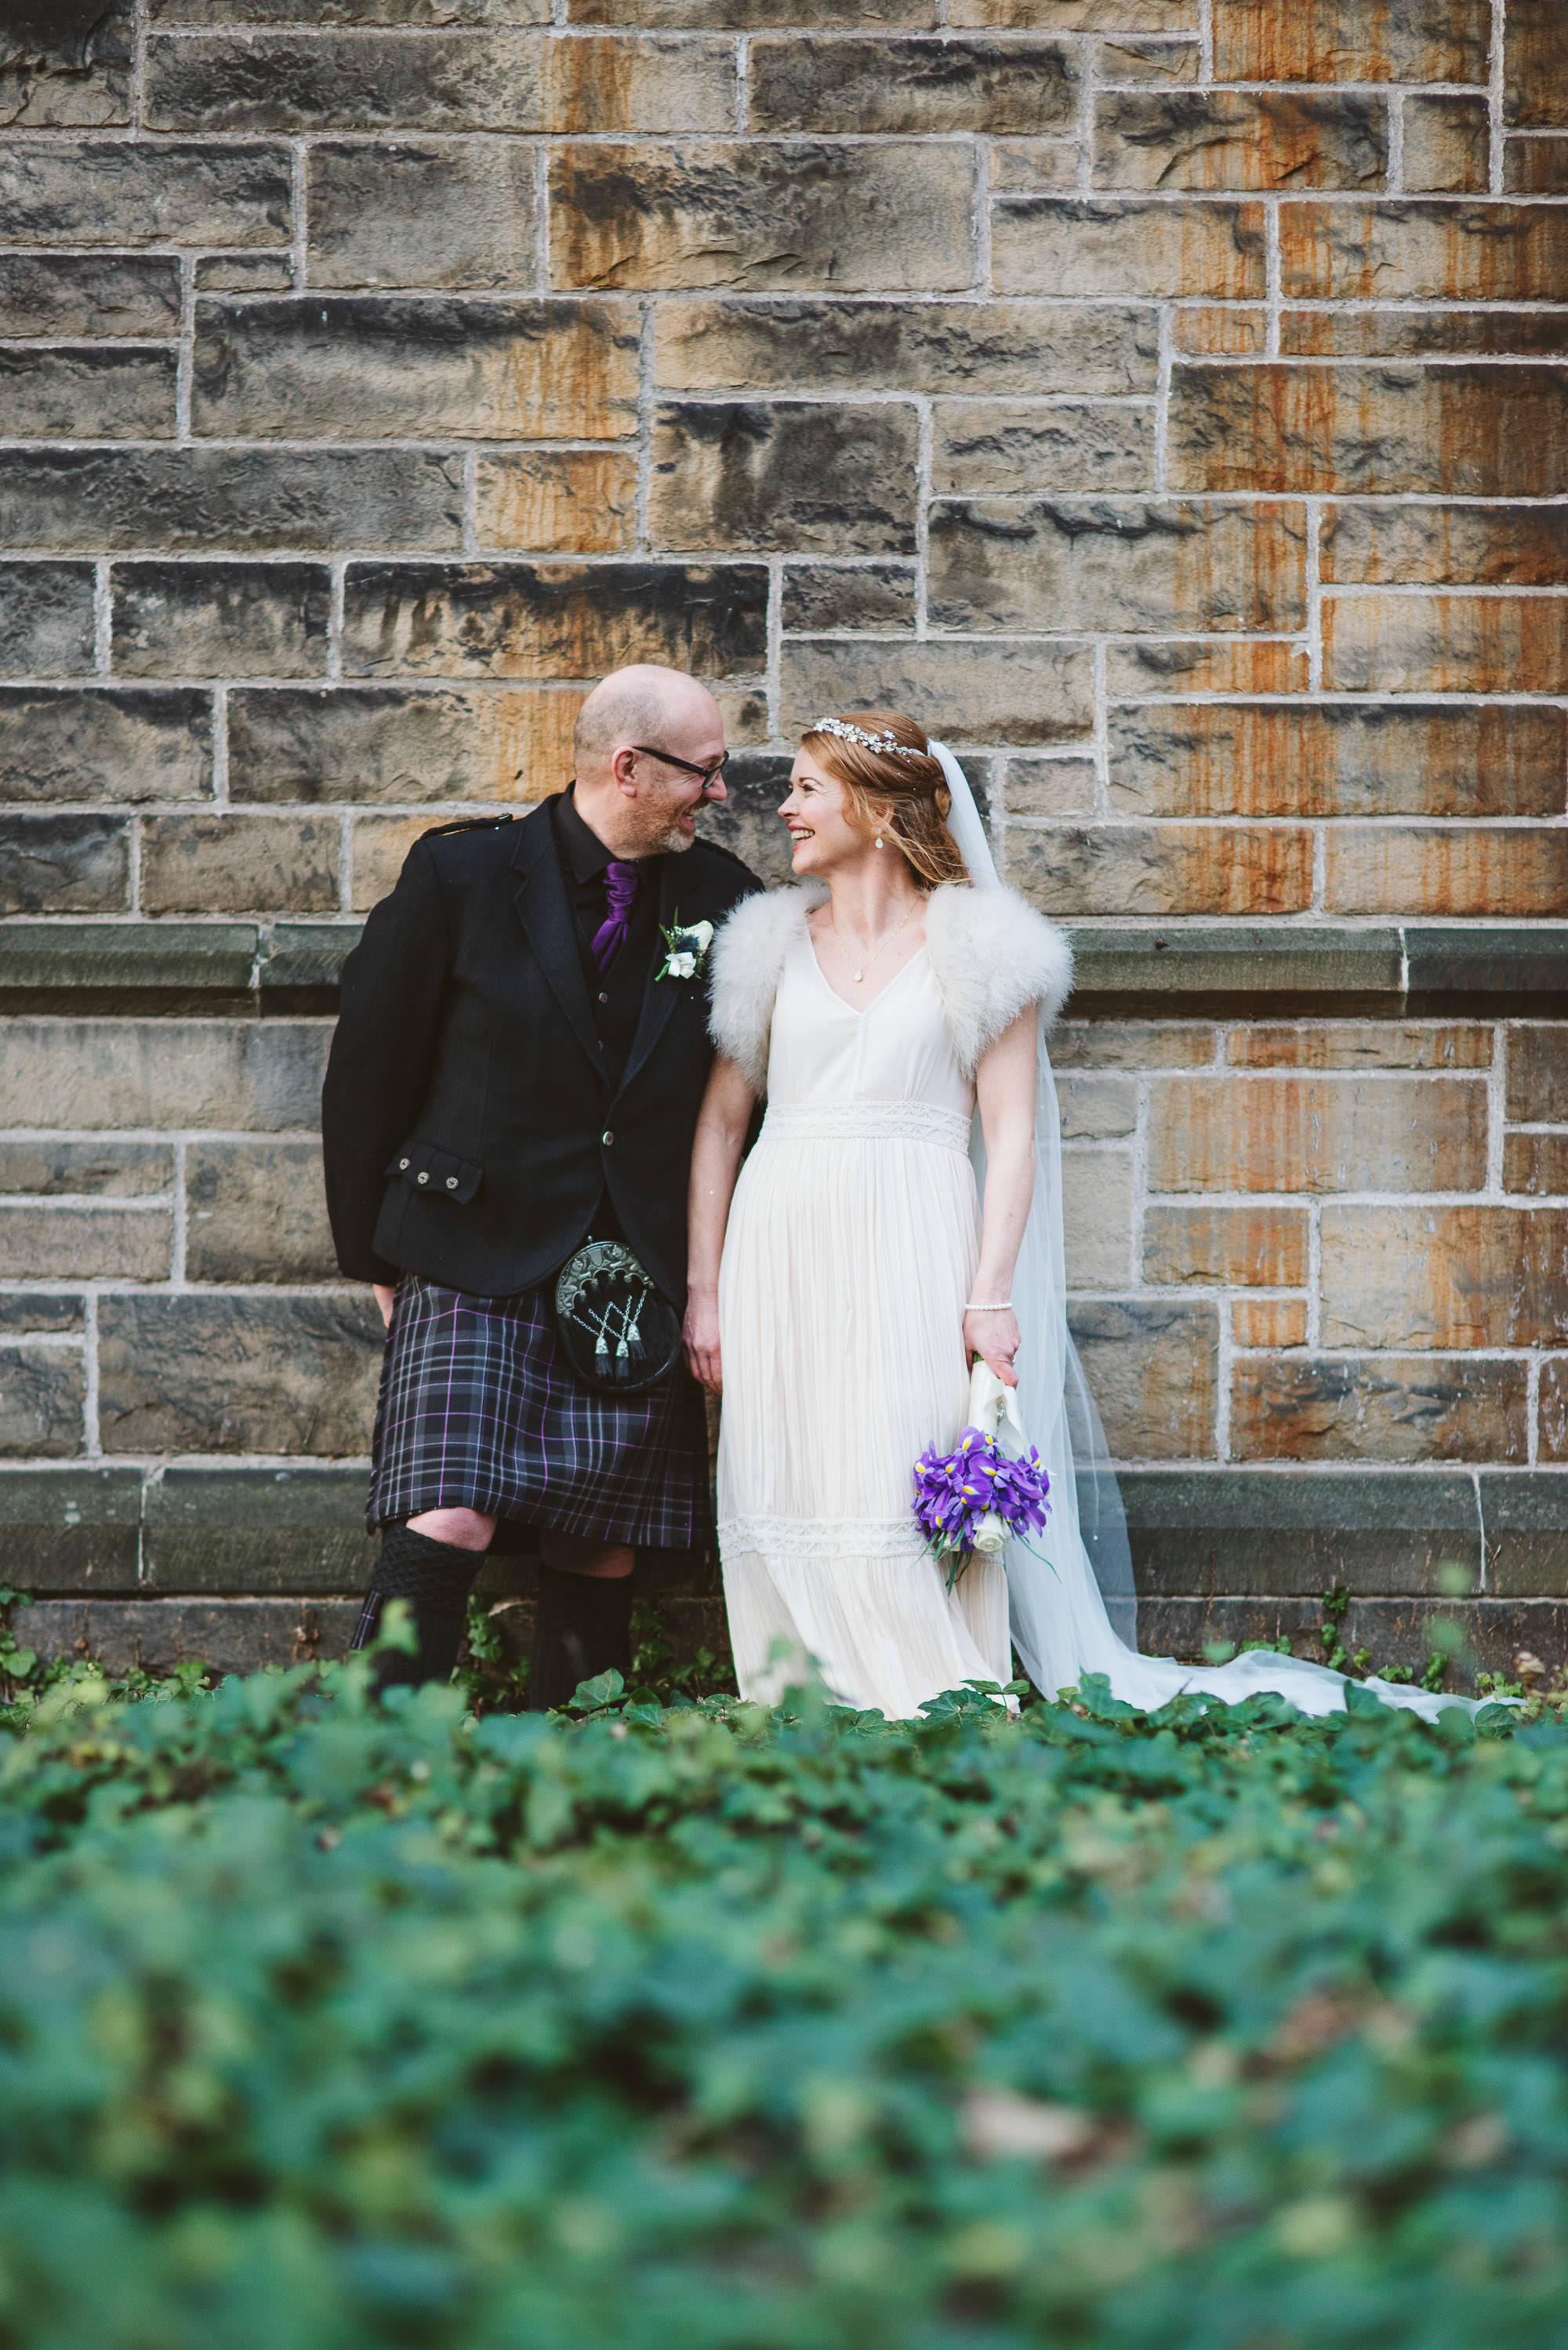 Wedding at mansfield traquair Edinburgh